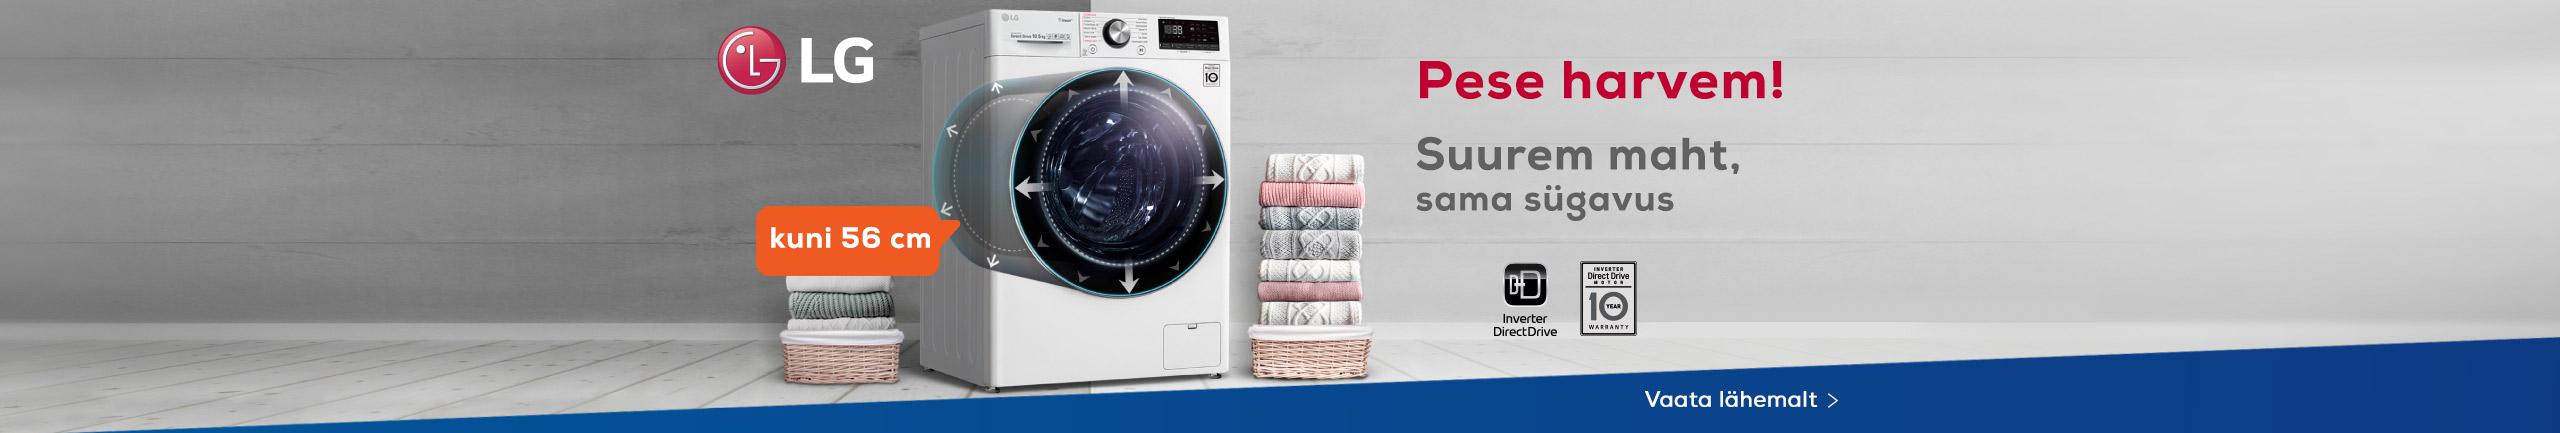 Discover LG washing machines